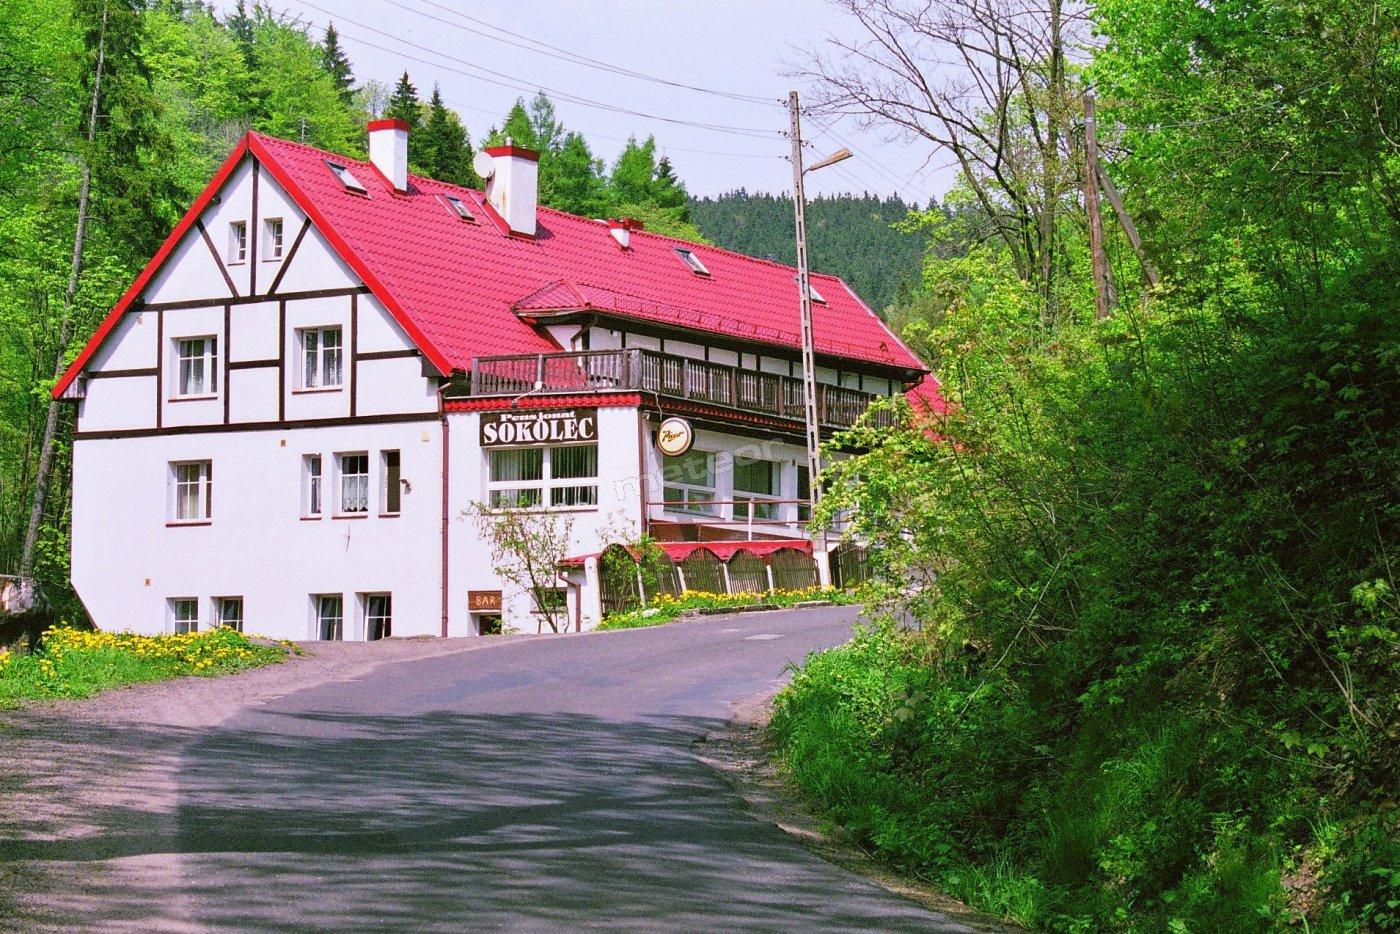 Pensjonat Sokolec